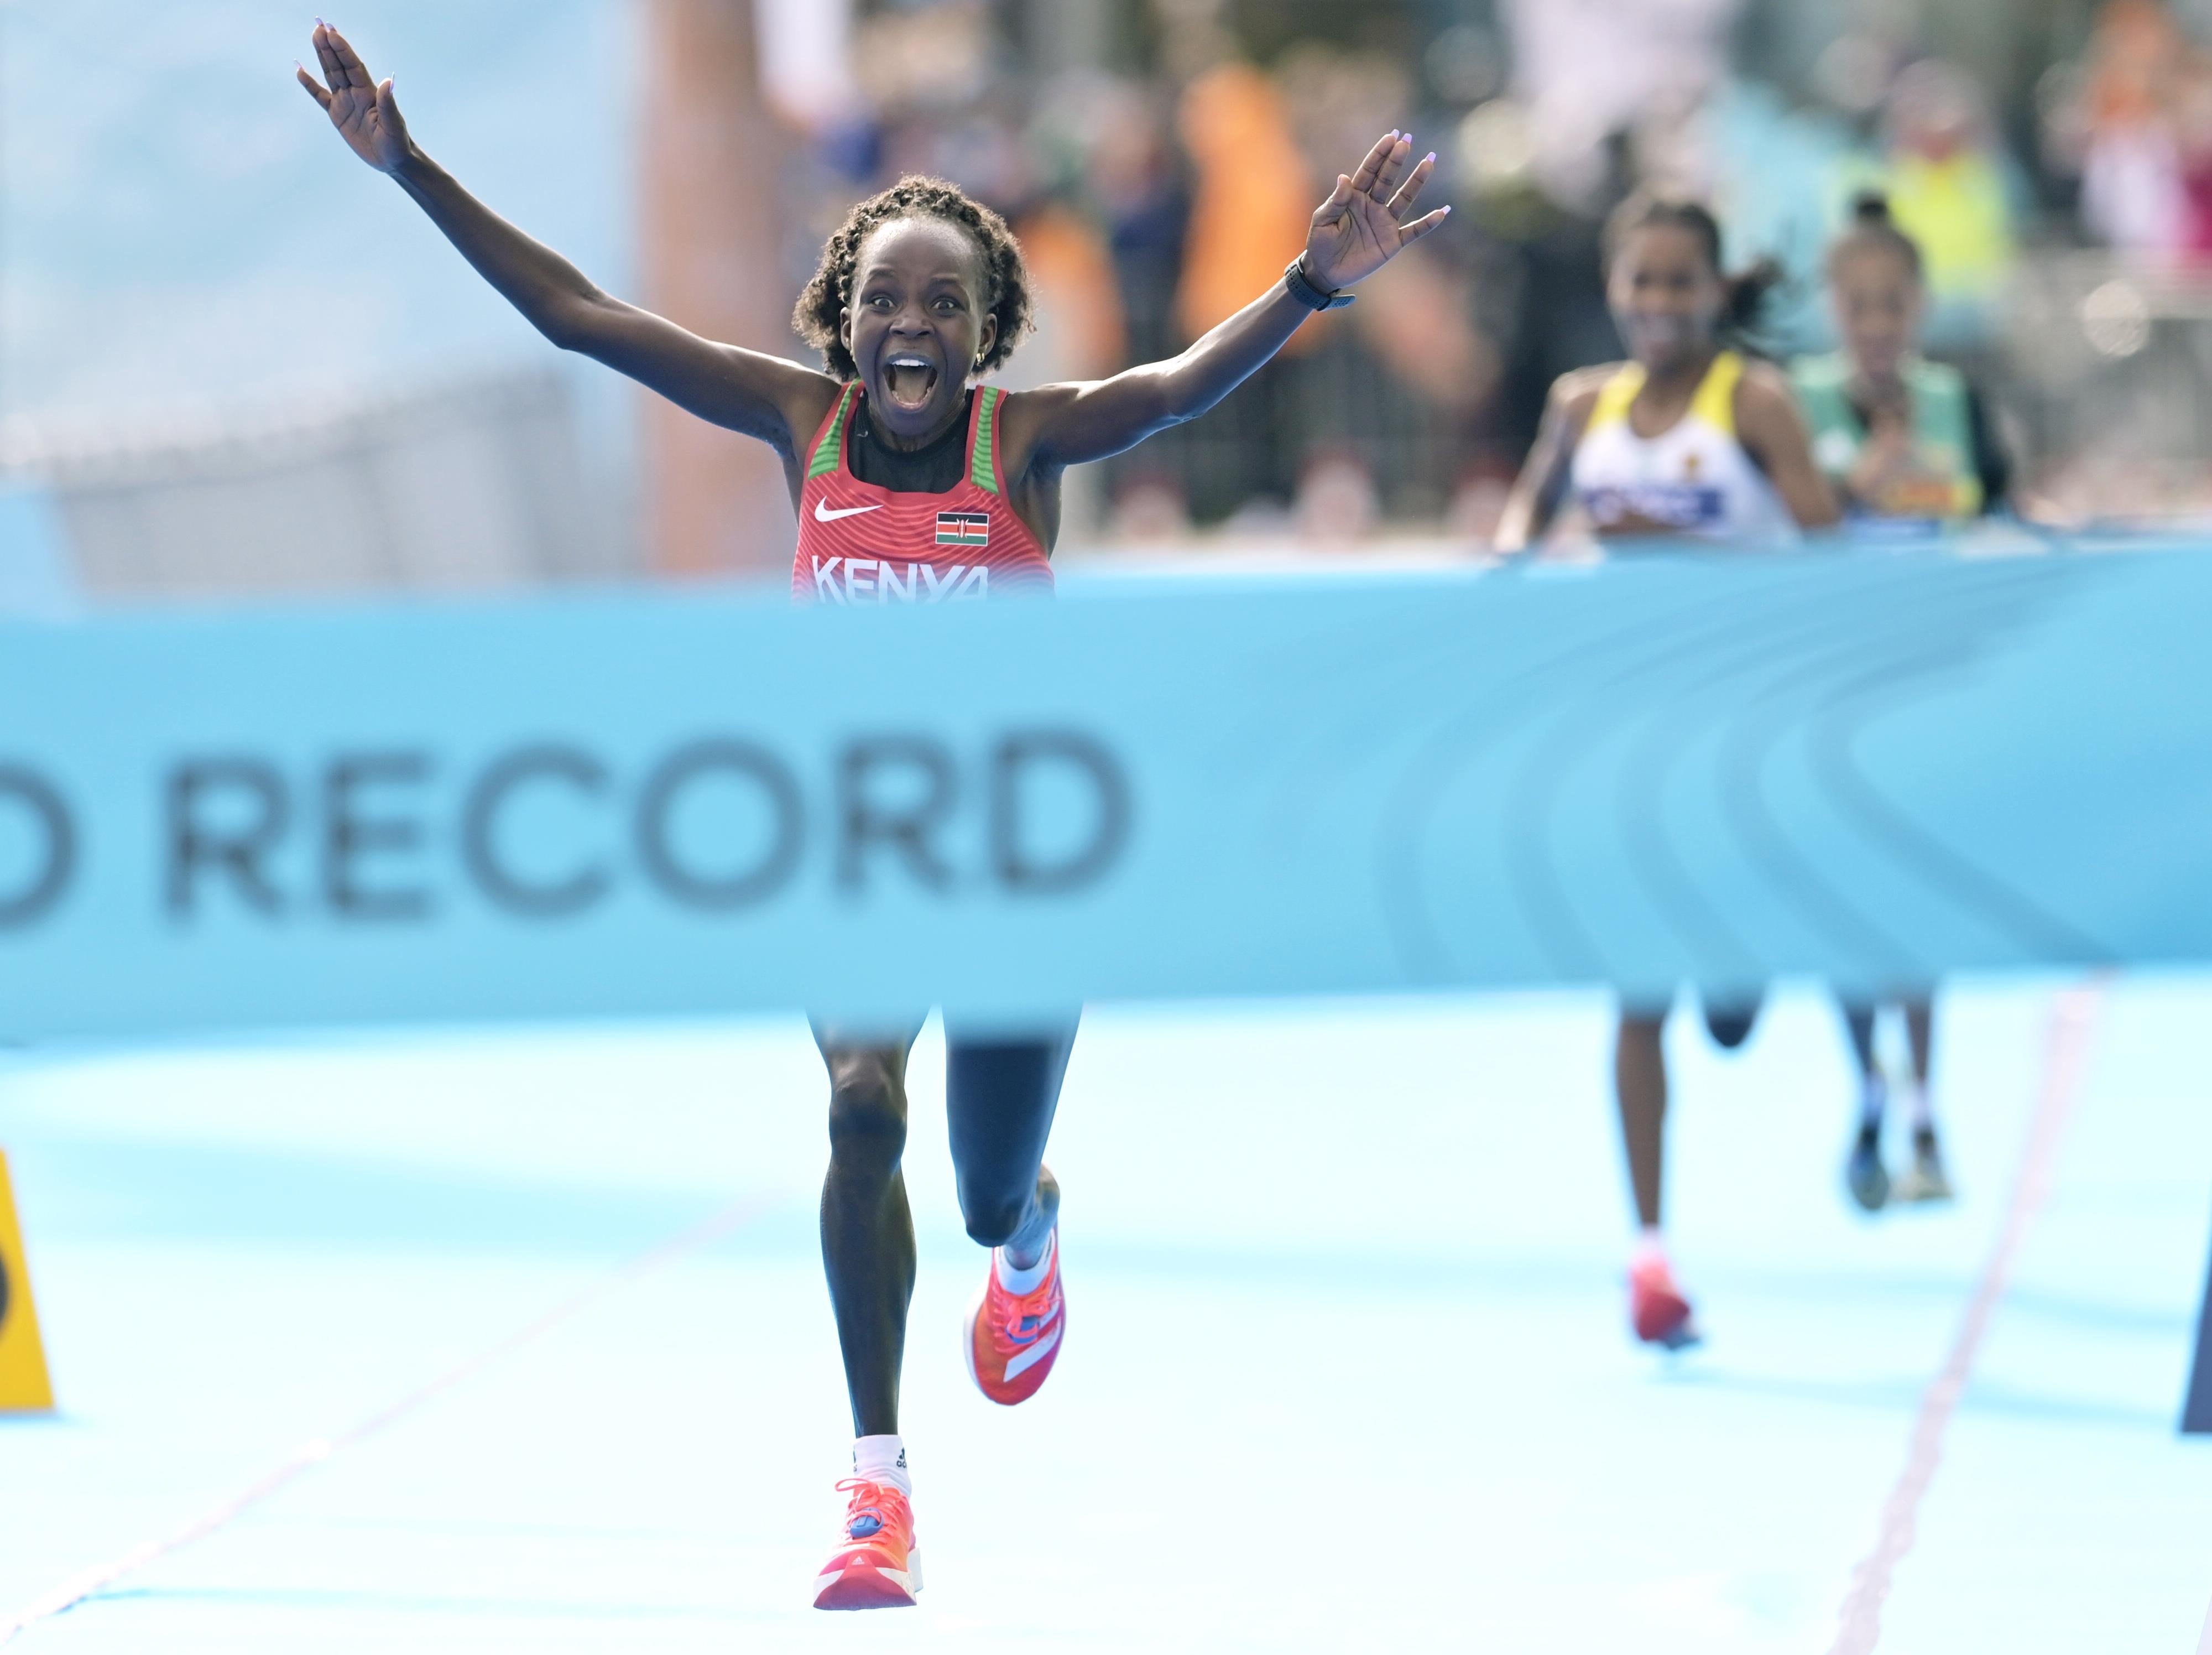 Peres Jepchirchir wins the World Athletics Half Marathon Championships Gdynia 2020 (Getty Images)